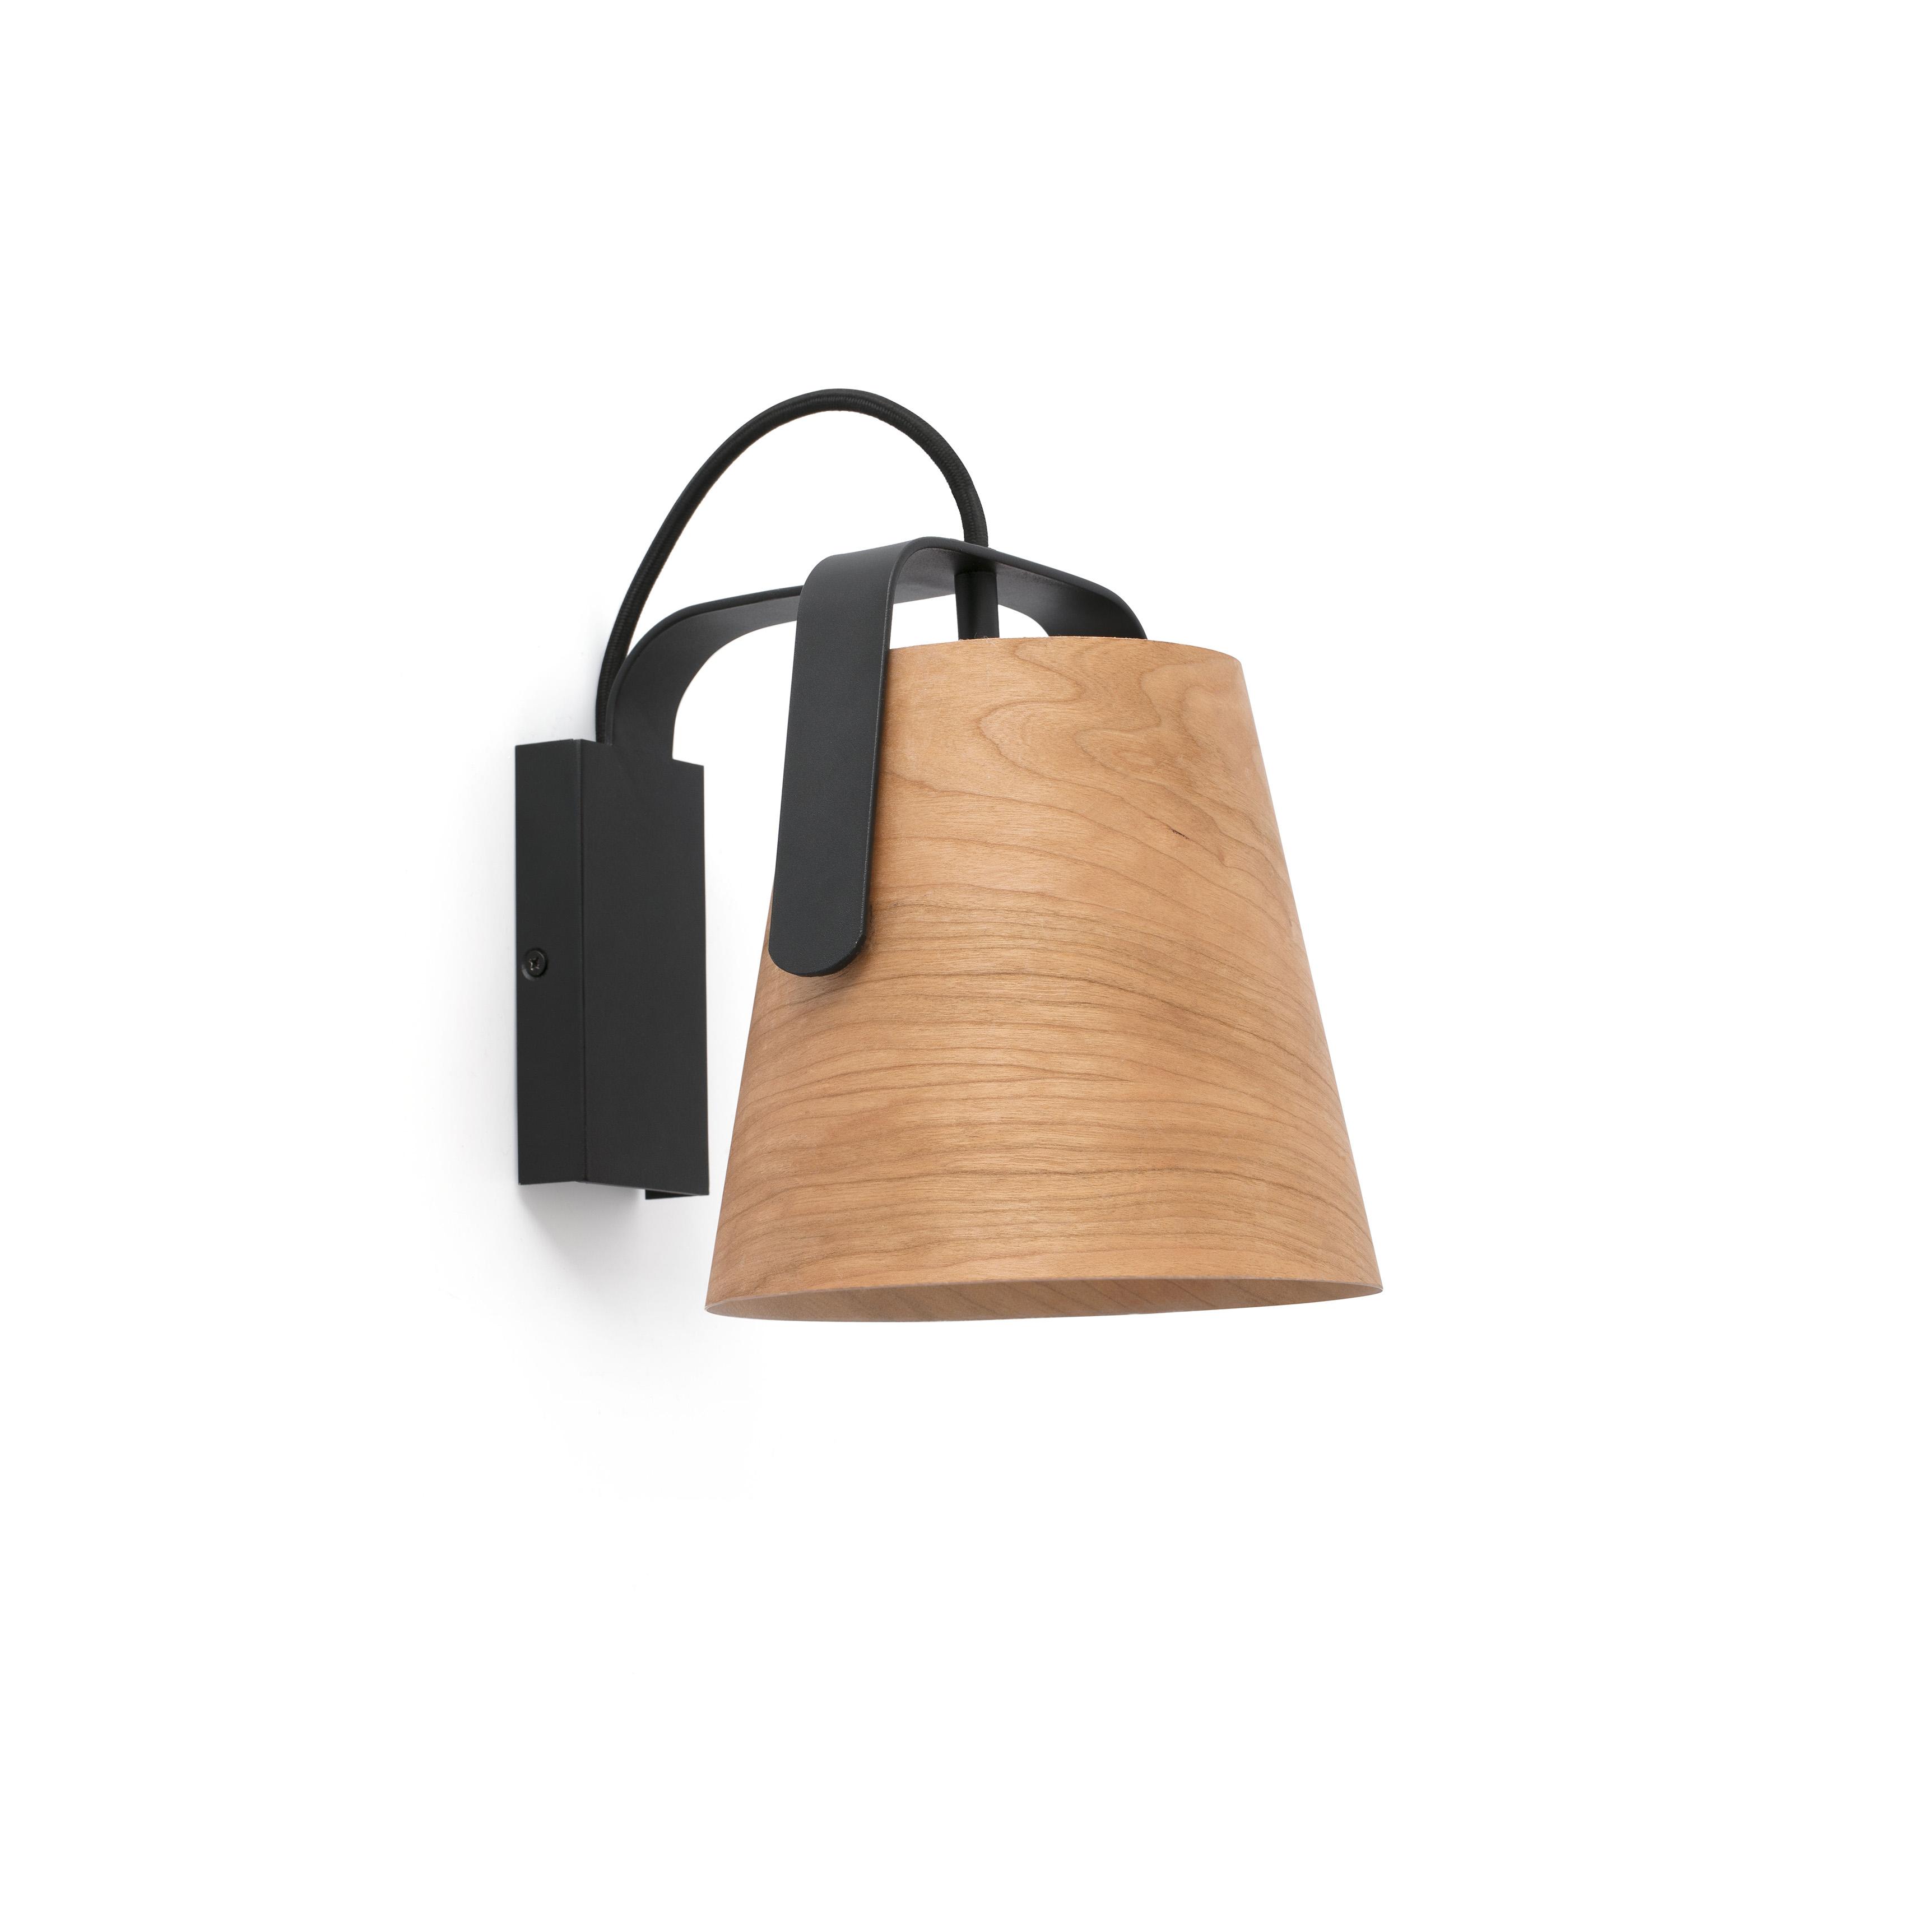 723cf8dc5a2 Aplique de pared para LED metal y madera natural 529844 ...